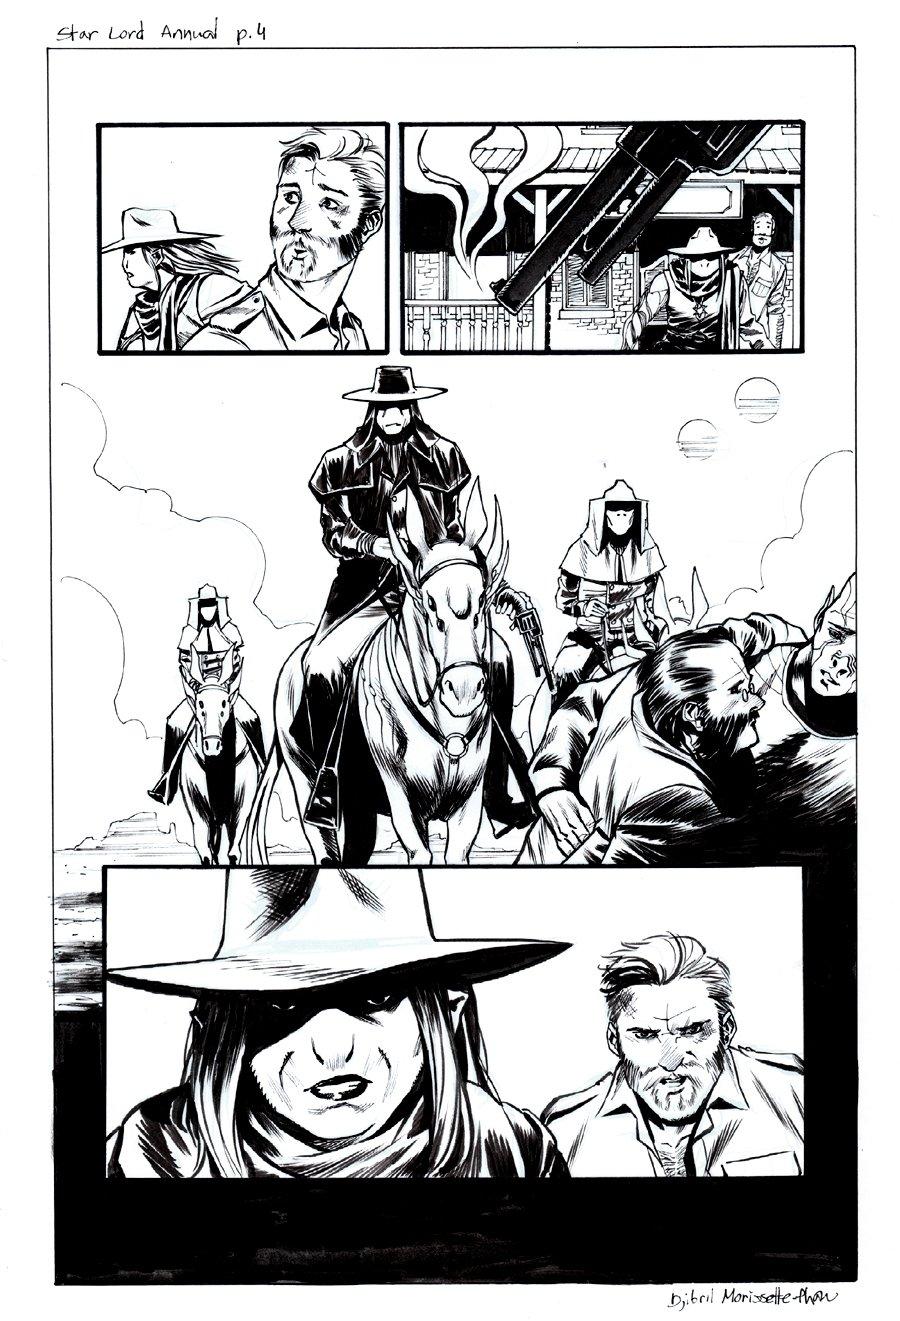 Starlord Annual p 4